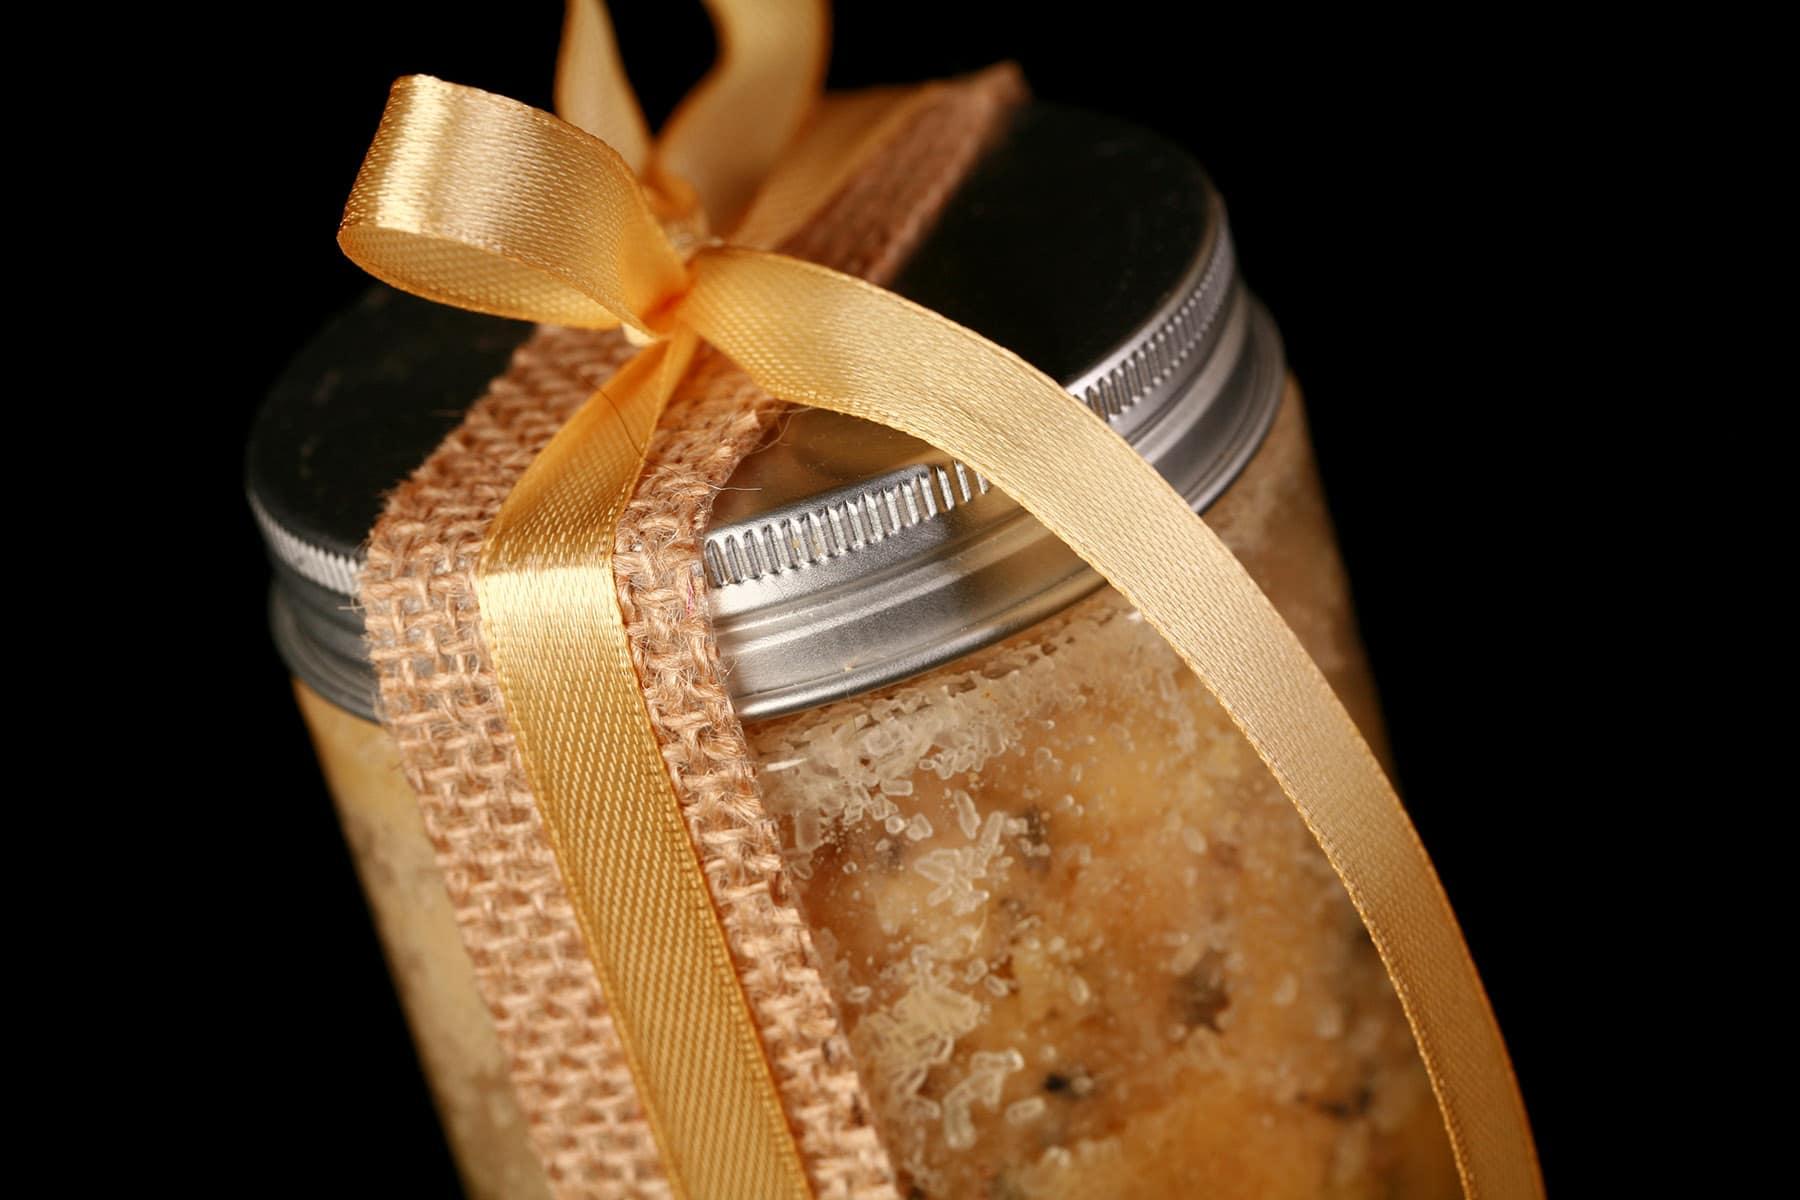 A small jar of mustard bath salt scrub. It is tied with a yellow bow.